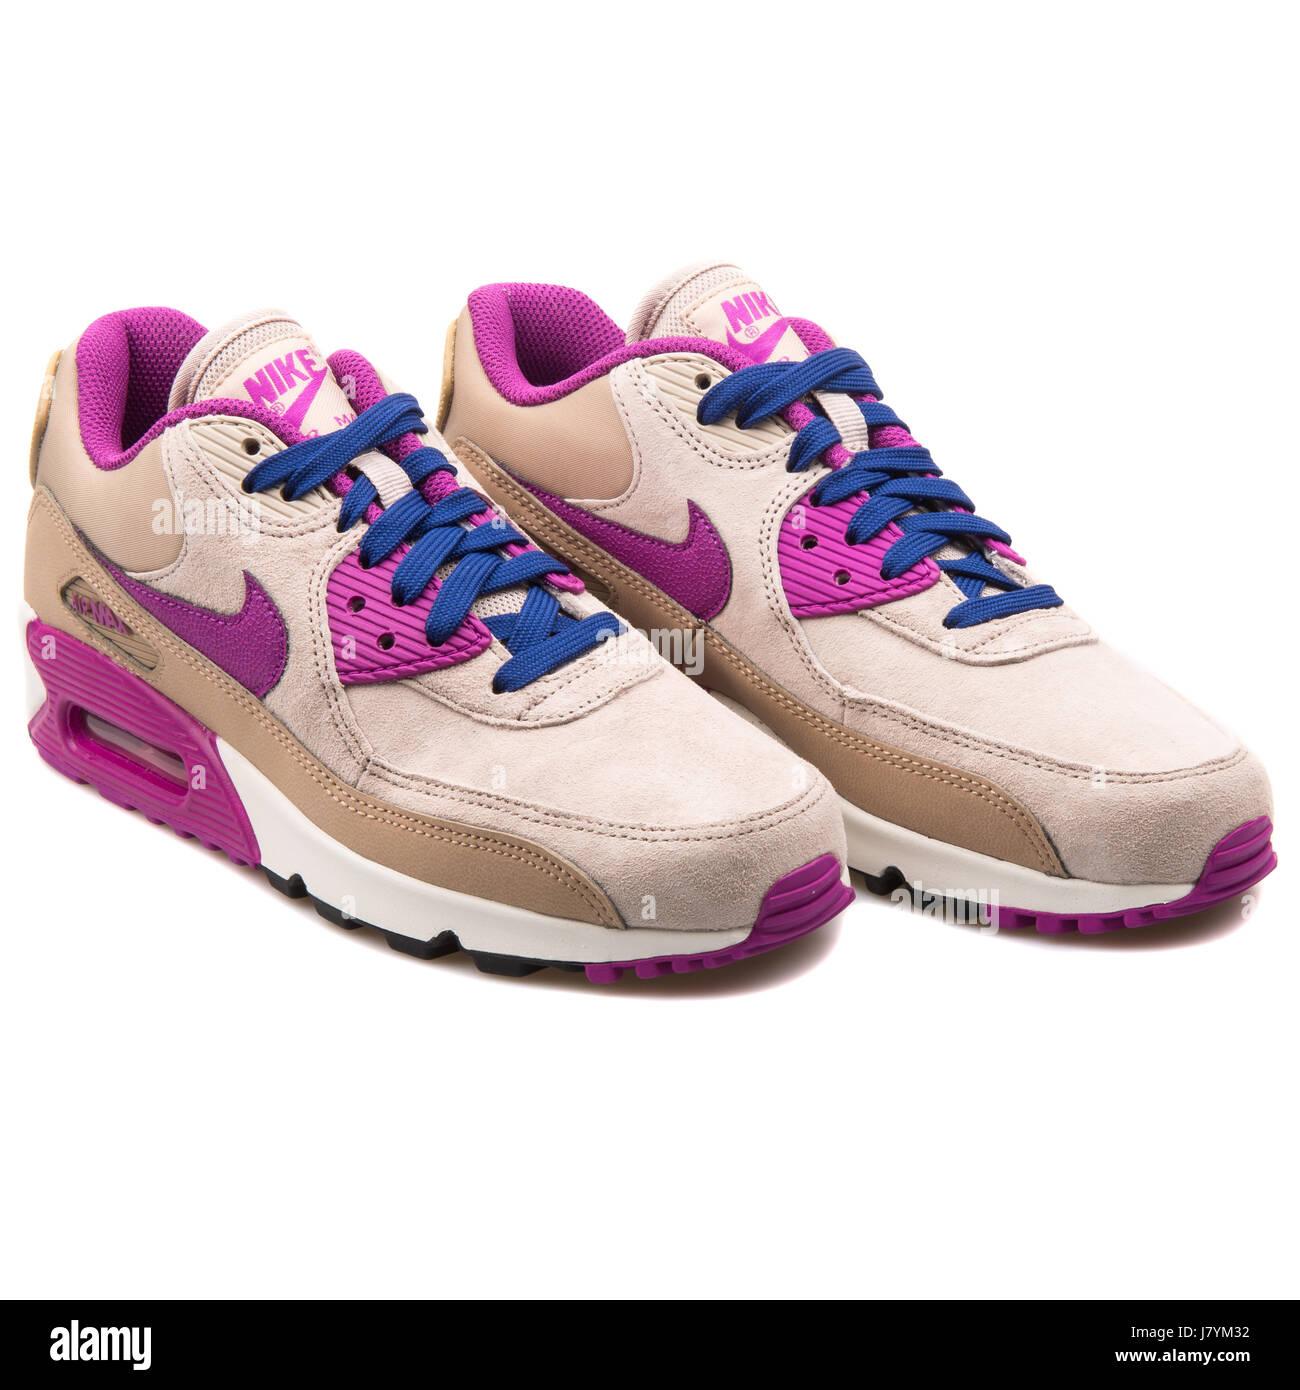 Nike Wmns Corriendo Air Max 90 Lthr Mujer Cuero Corriendo Wmns Desierto  Purple 1668c9